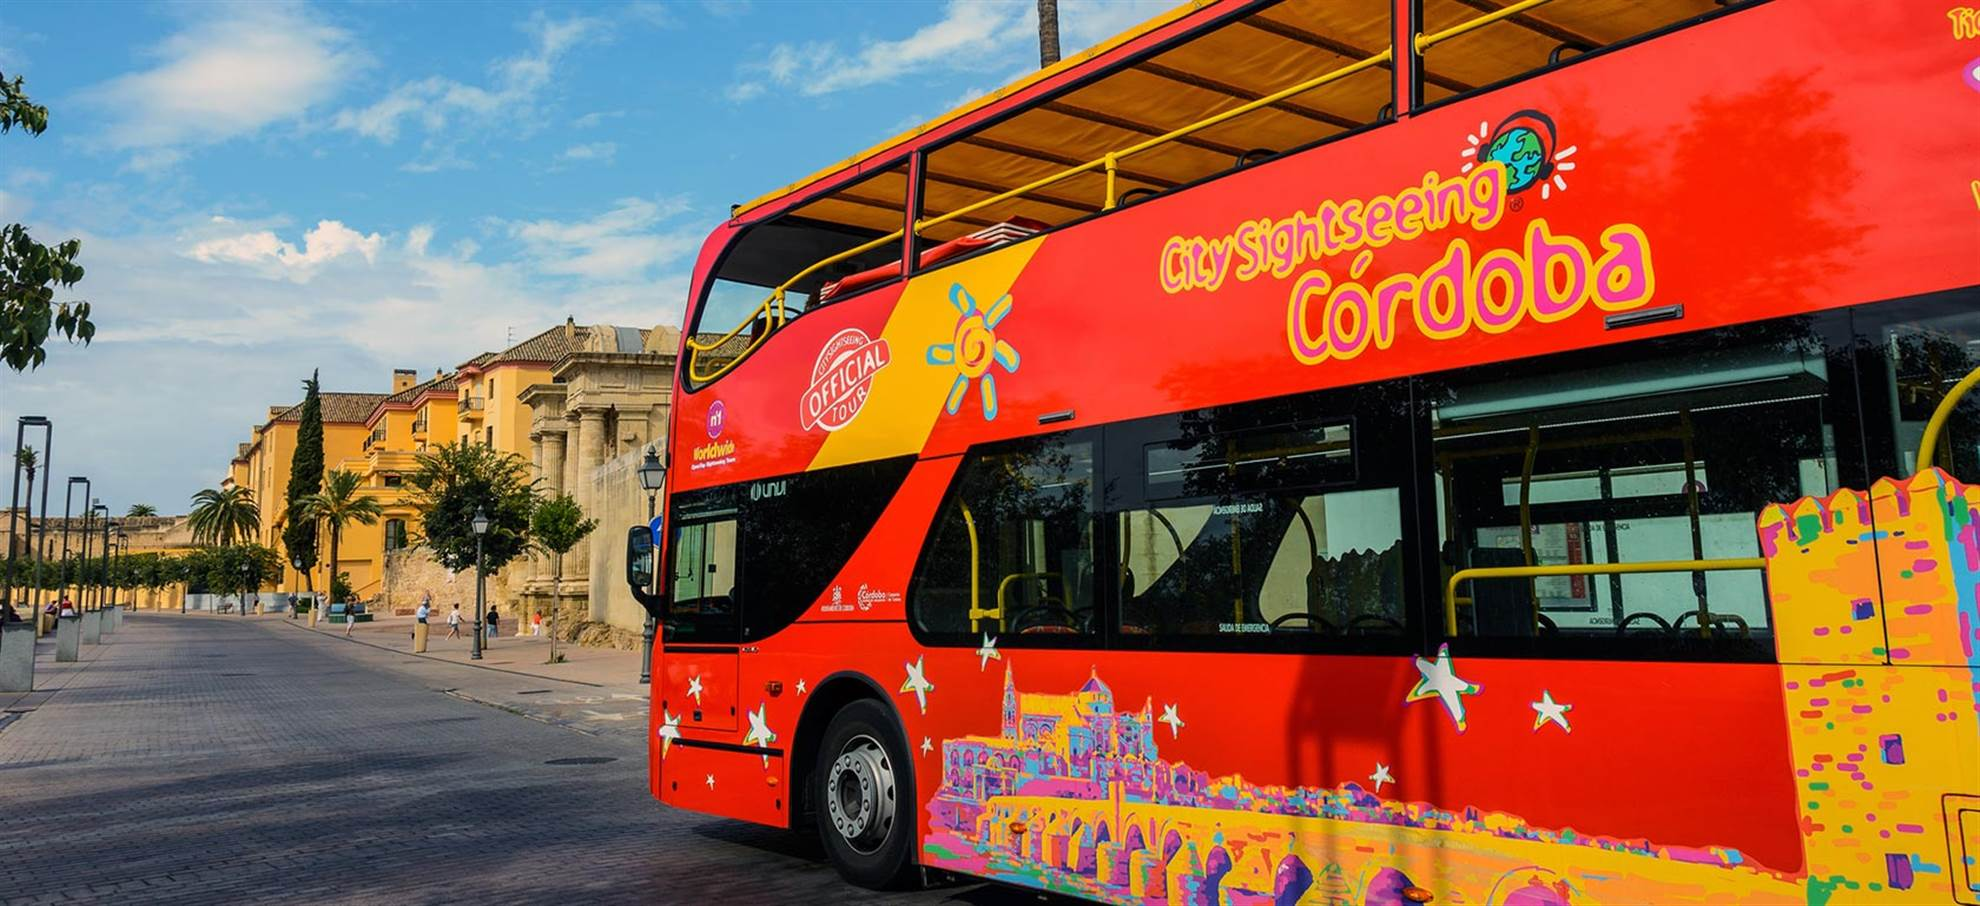 Cordoba Hop on Hop off bus